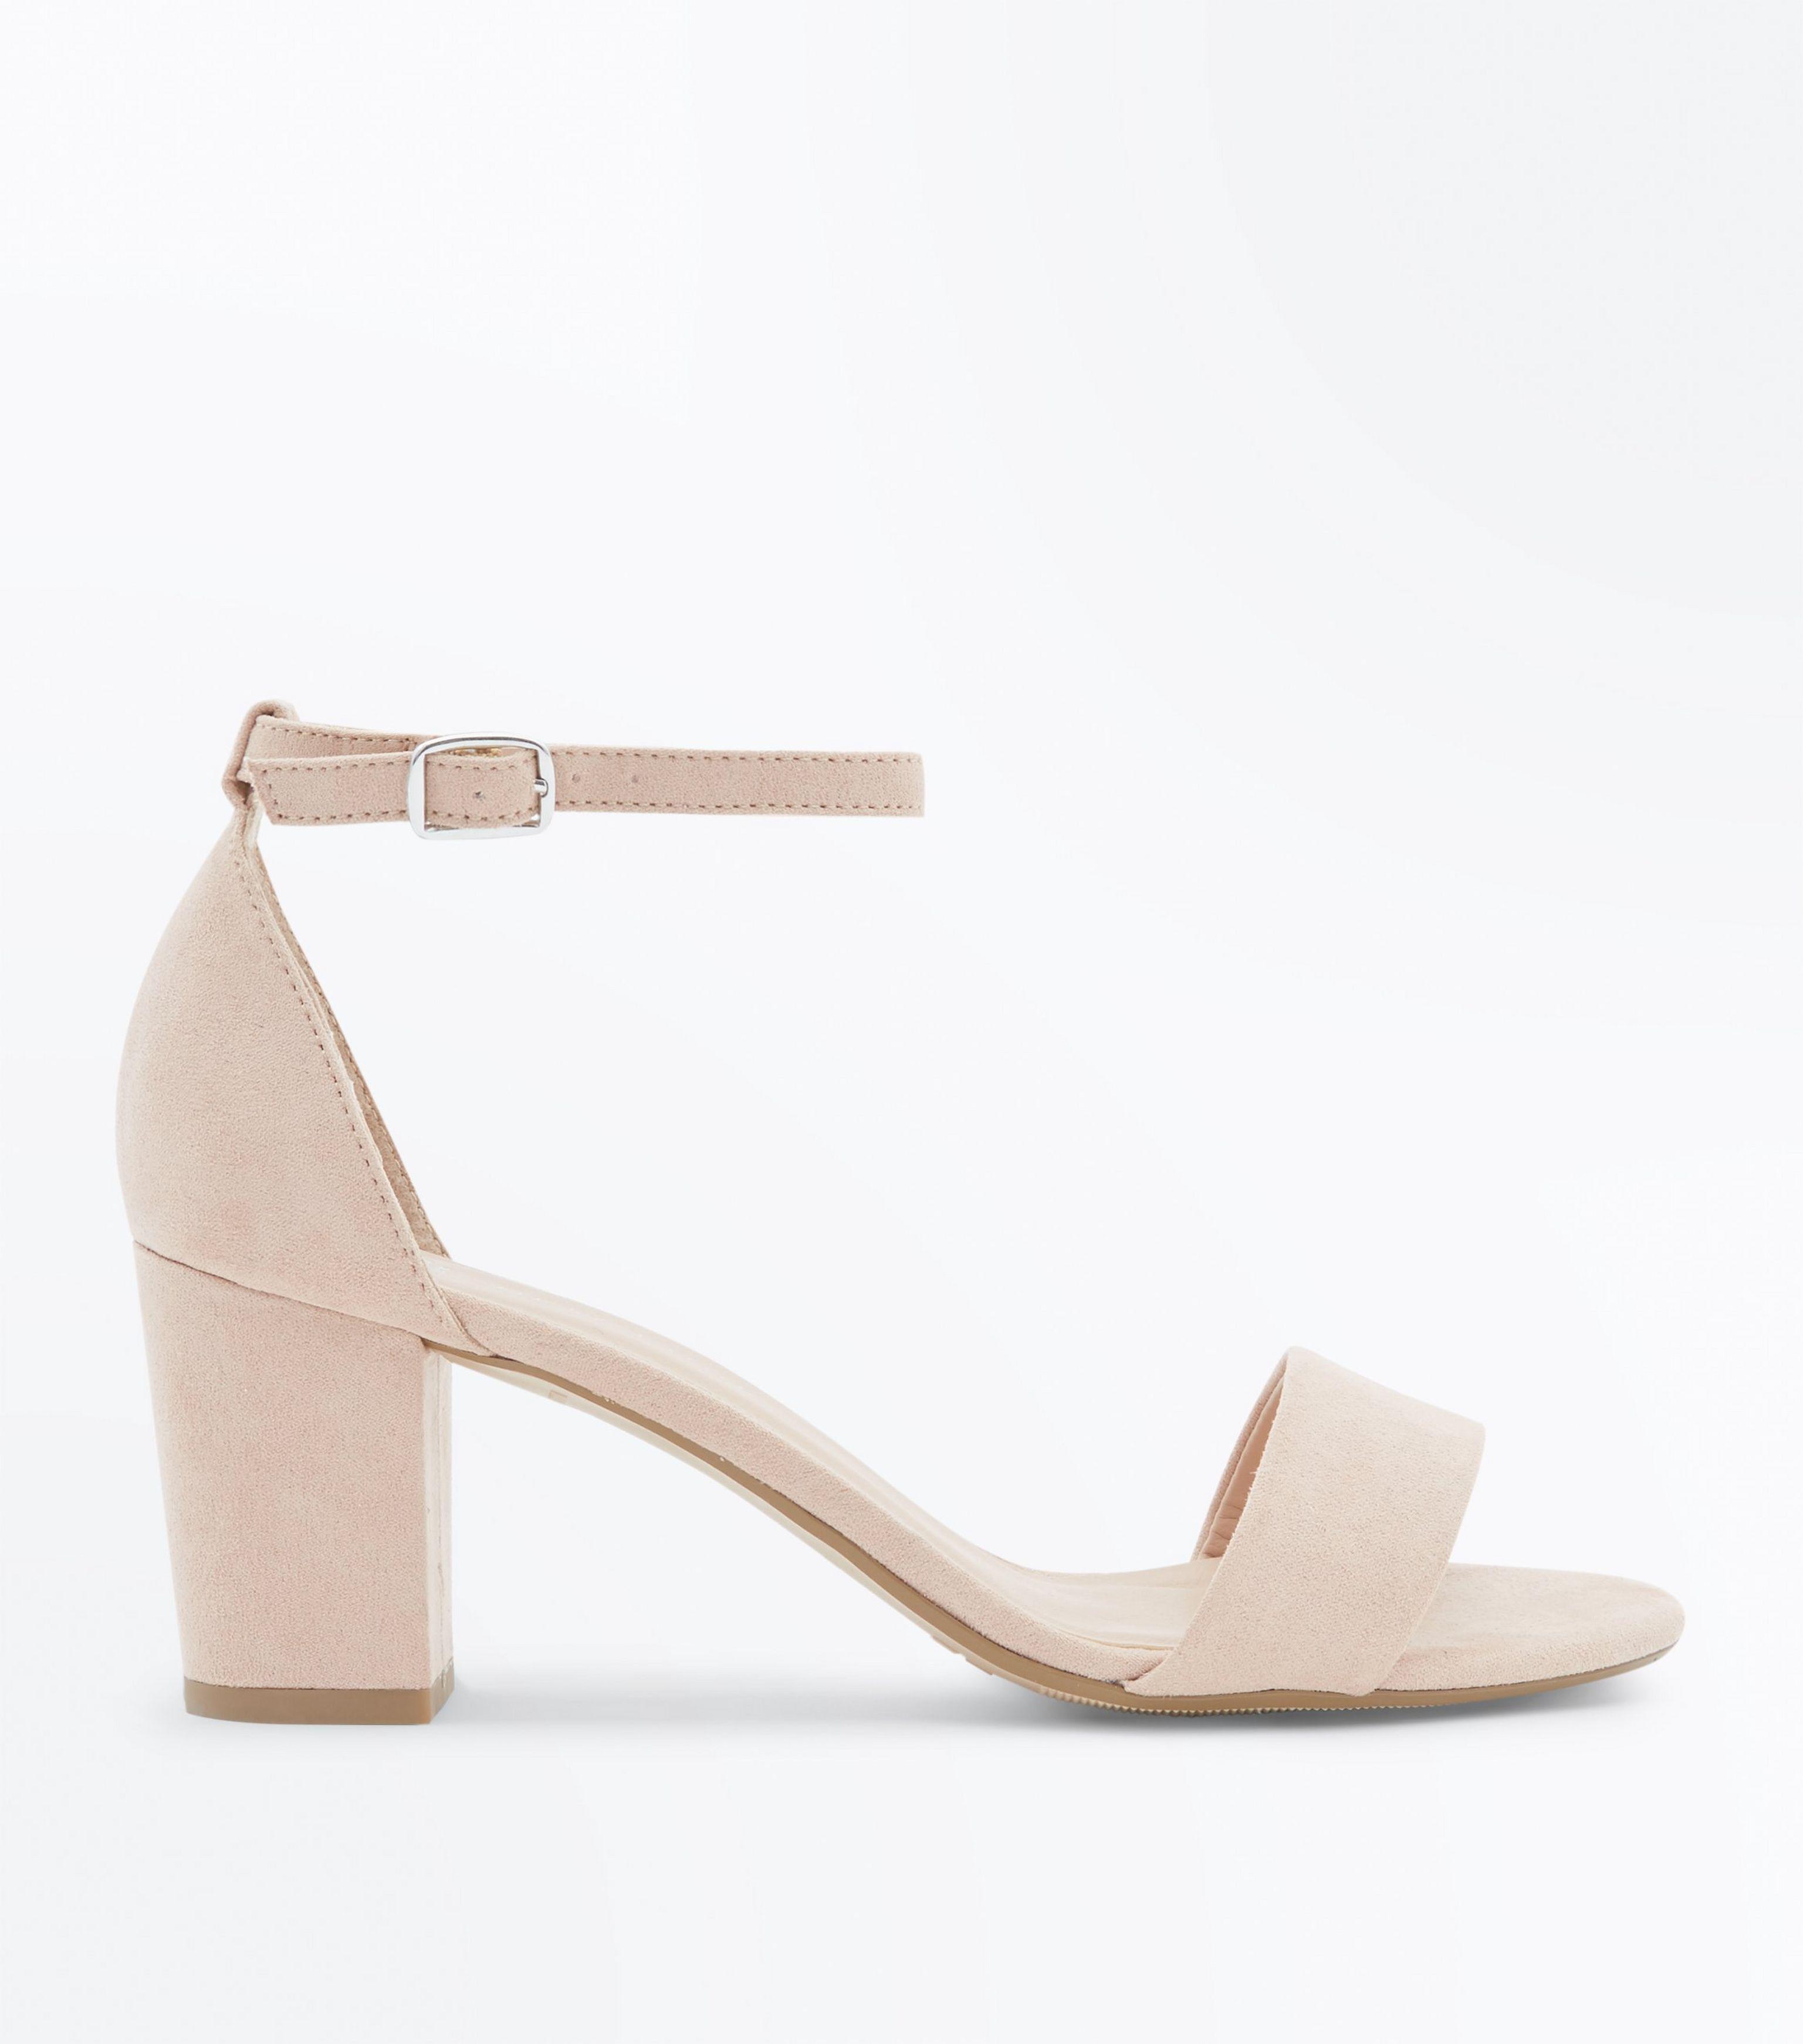 exquisite design outlet for sale special sales Girls Nude Suedette Mid Heel Sandals